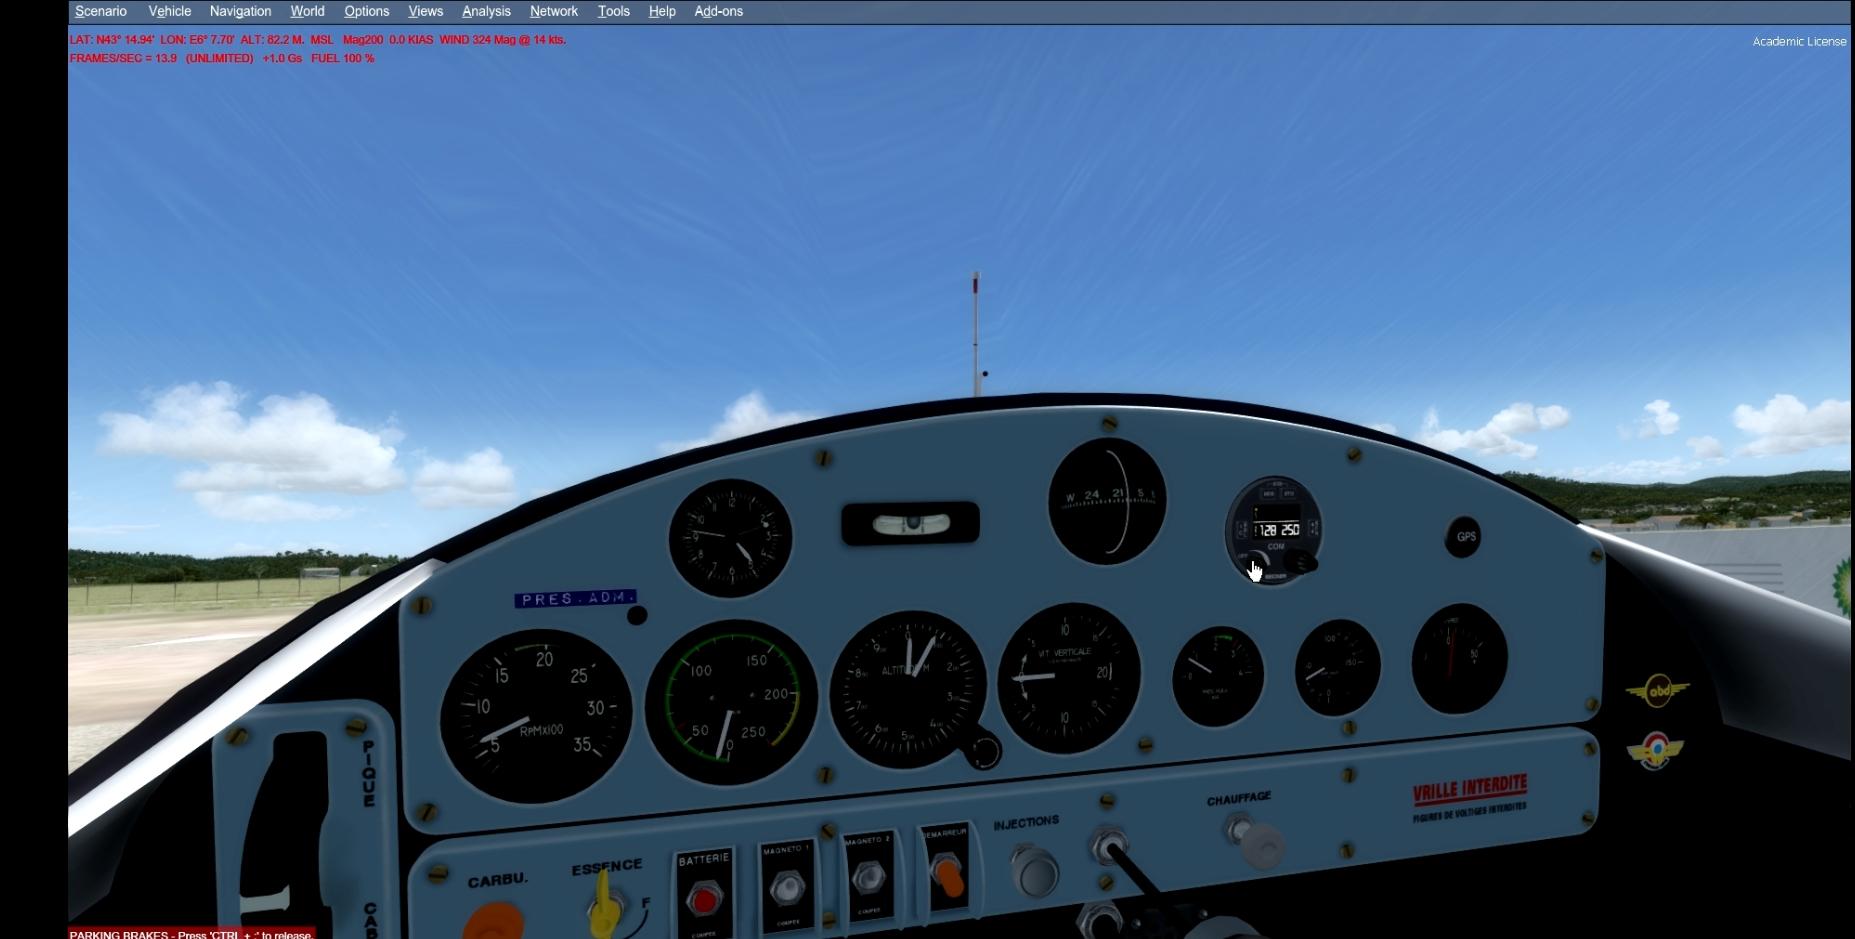 http://www.pilote-virtuel.com/img/gallery/1517065348.jpg